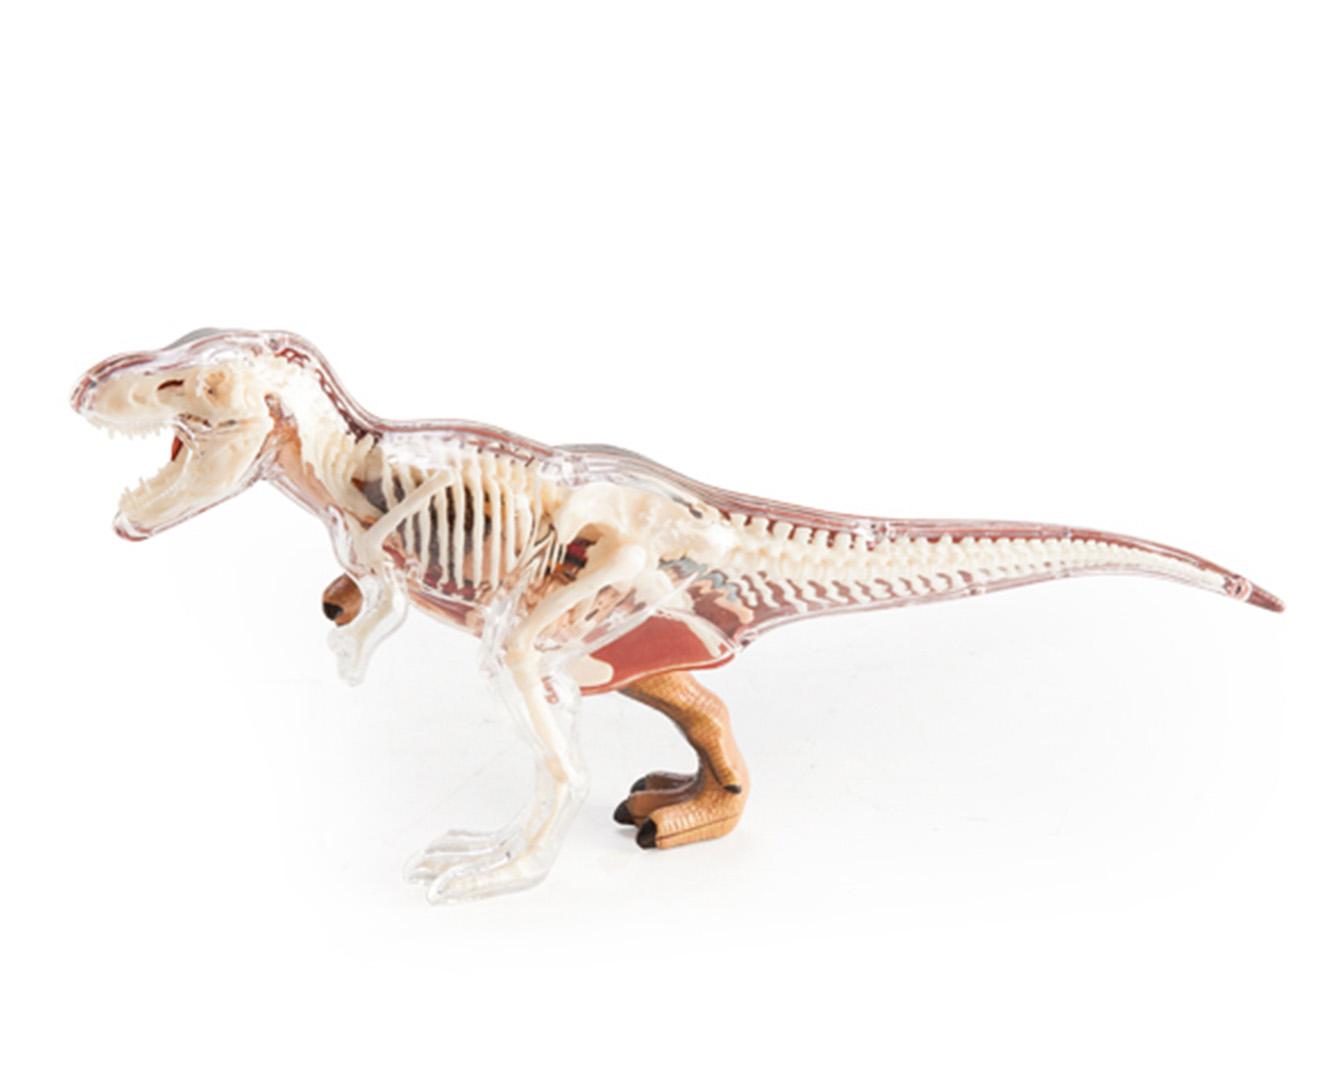 4D Vision - T-Rex anatomy model 9318051113442 | eBay